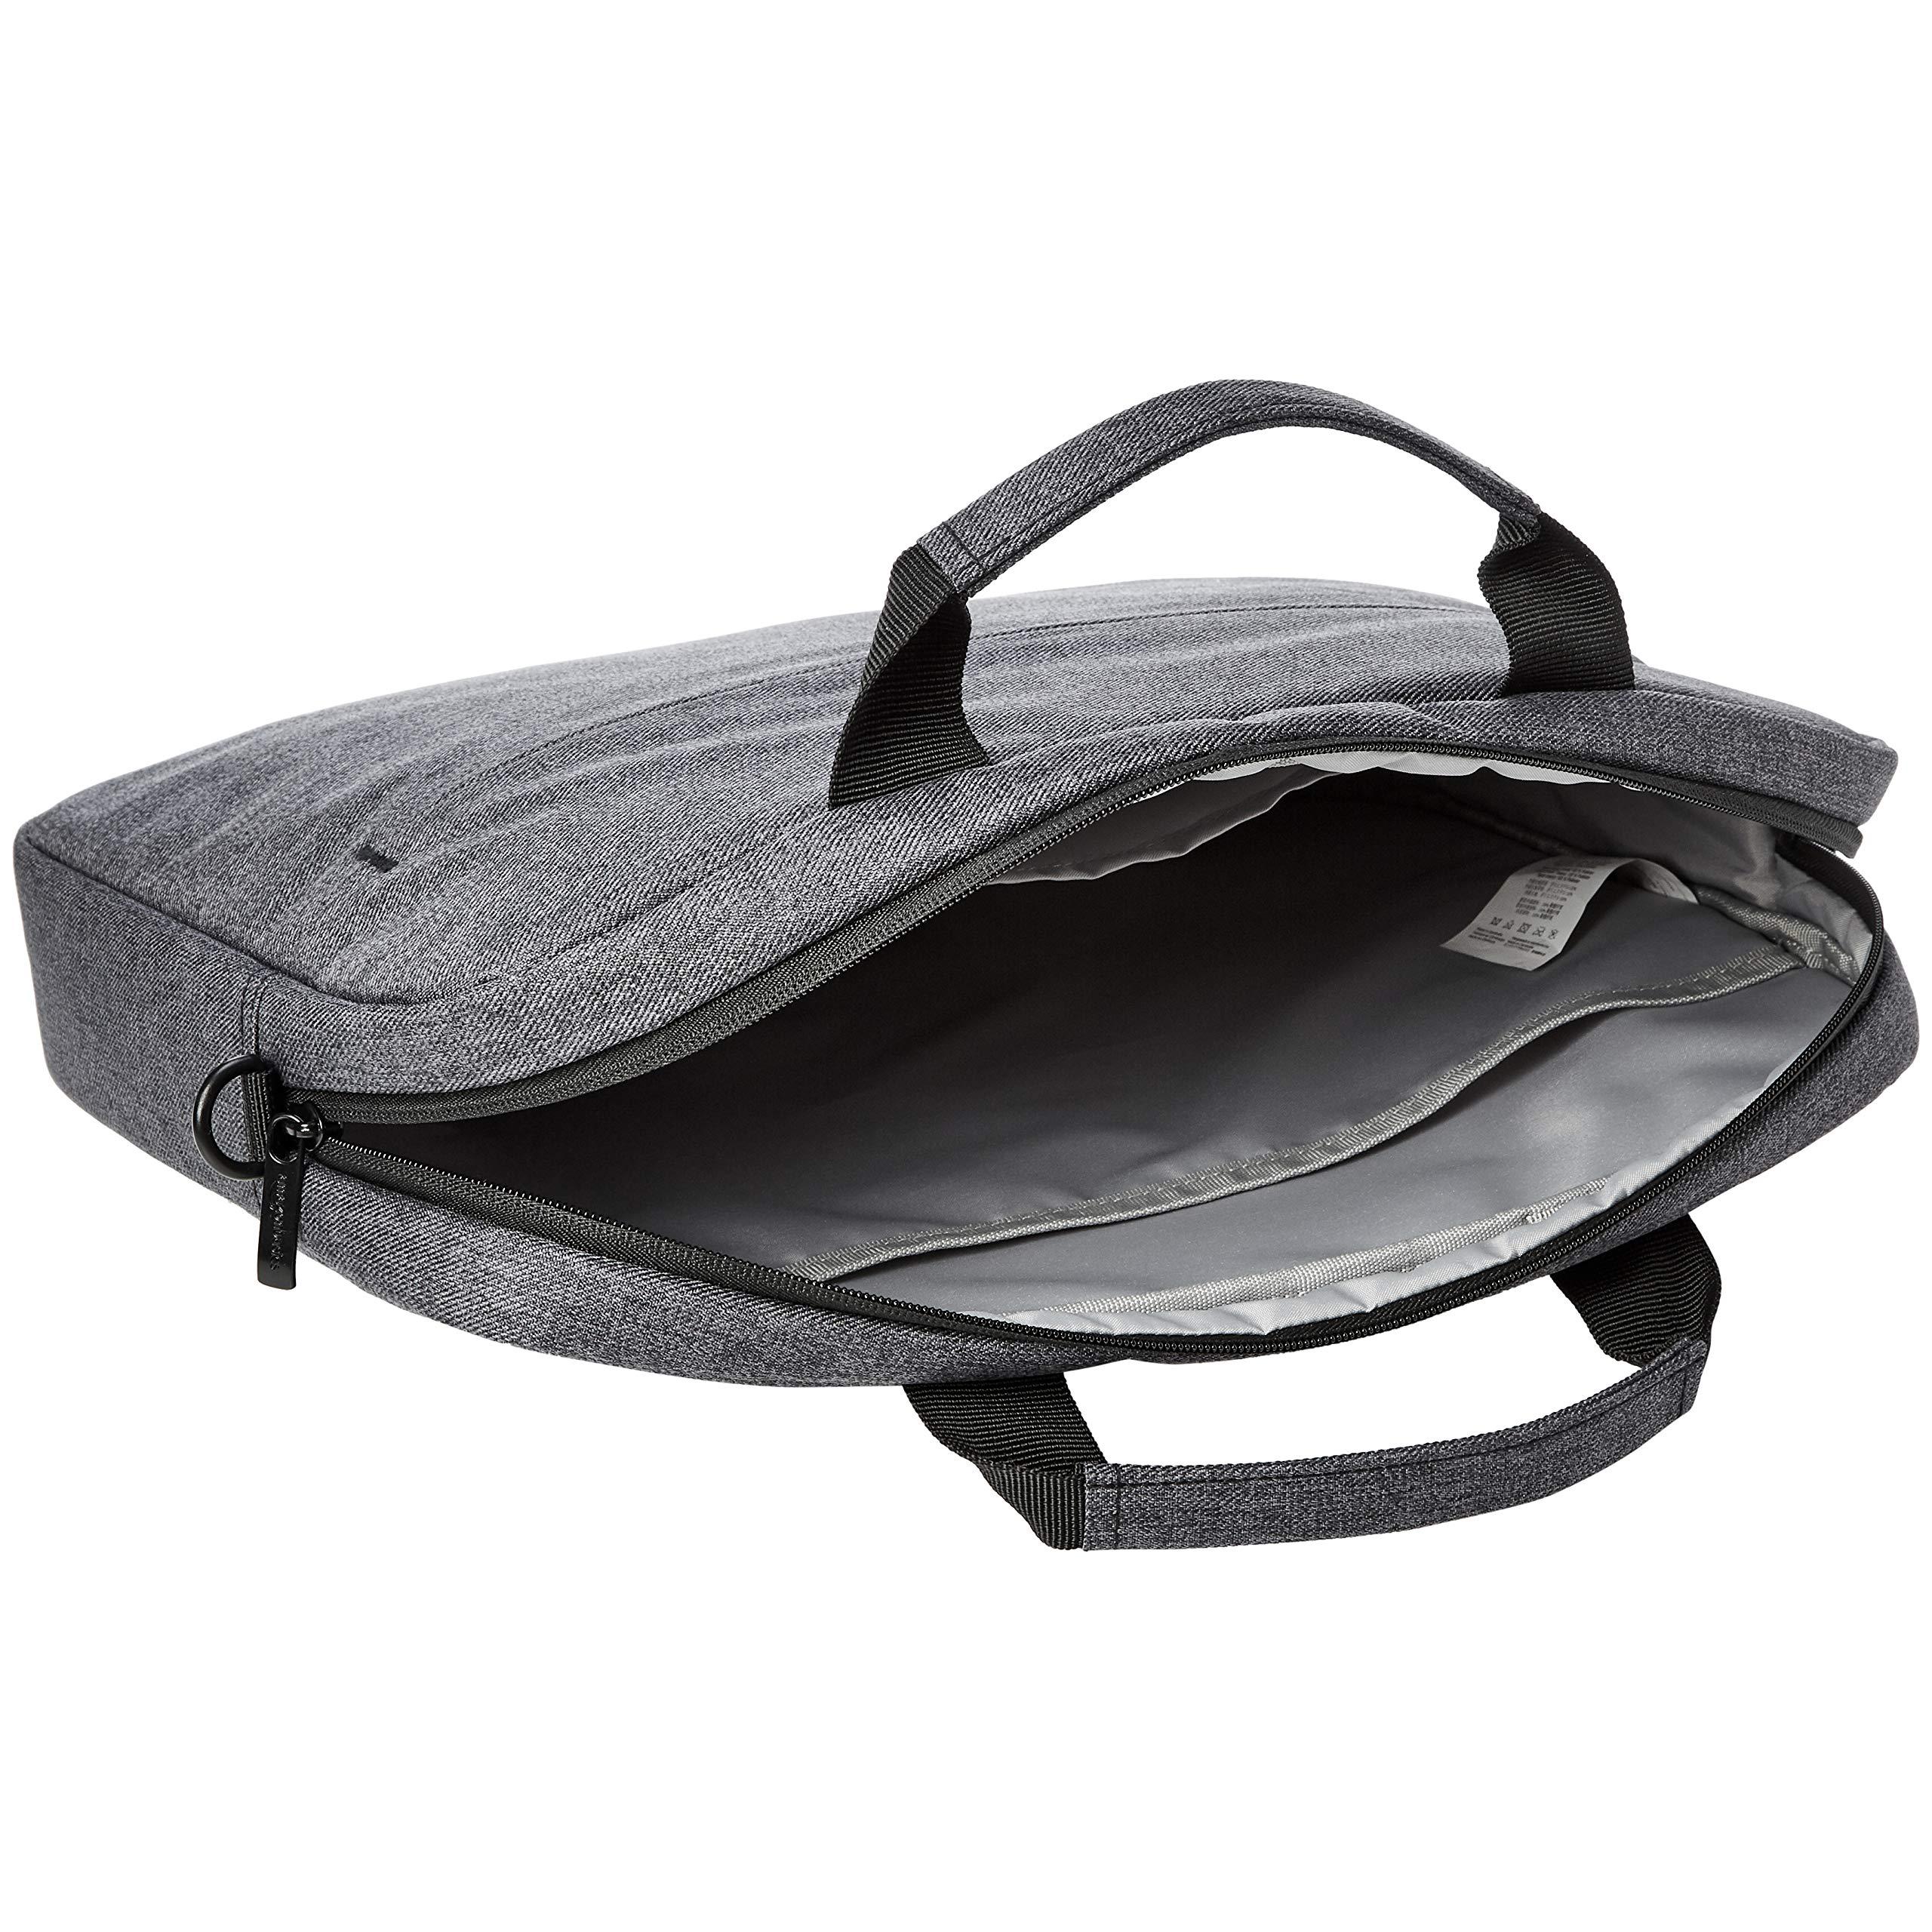 AmazonBasics Urban Laptop and Tablet Case Bag, 17 Inch, Grey by AmazonBasics (Image #6)